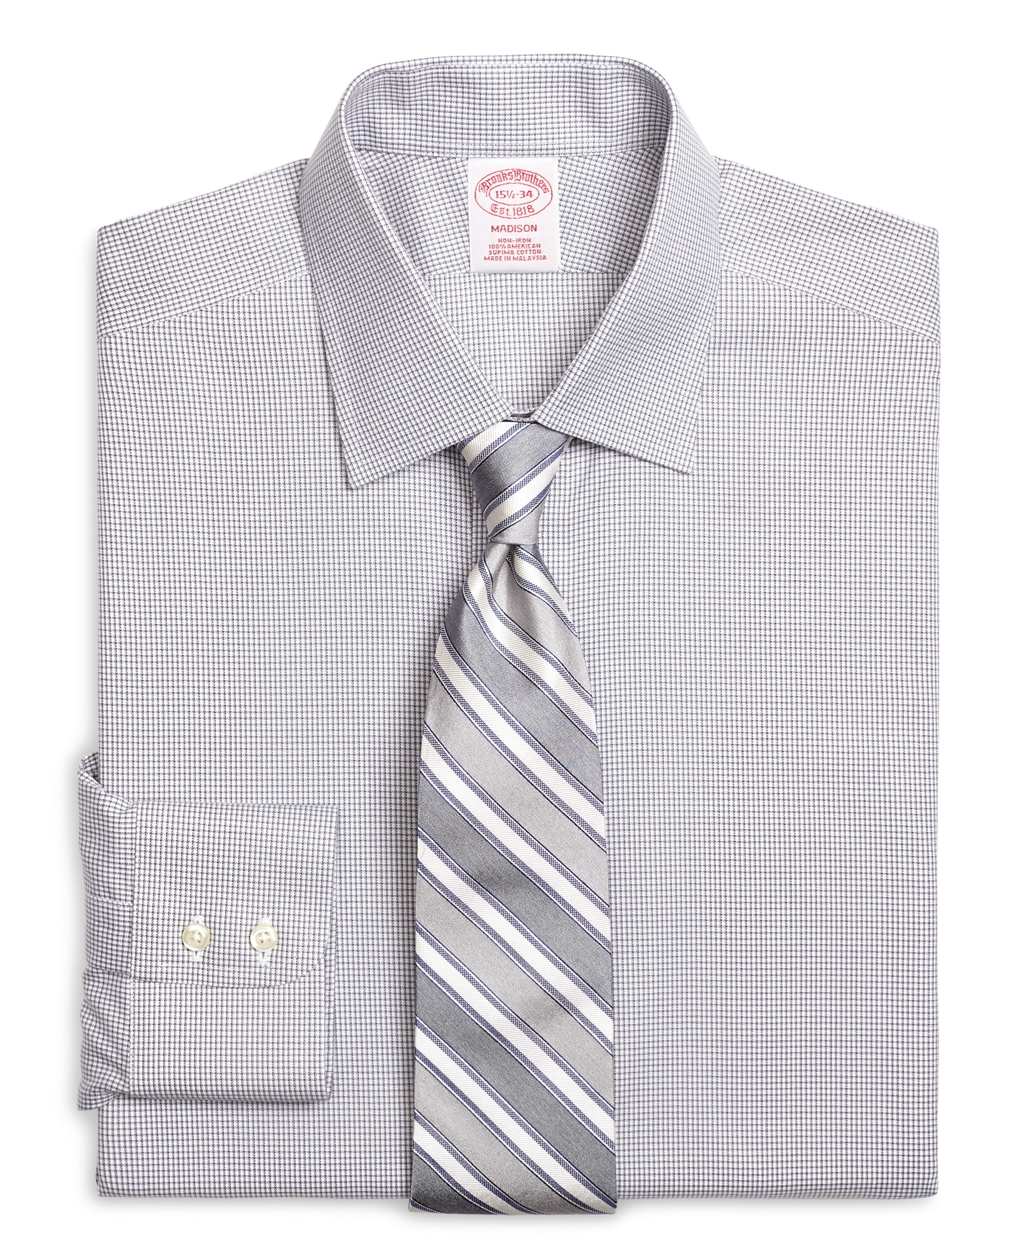 Brooks brothers non iron milano fit micro check dress for Brooks brothers non iron shirts review